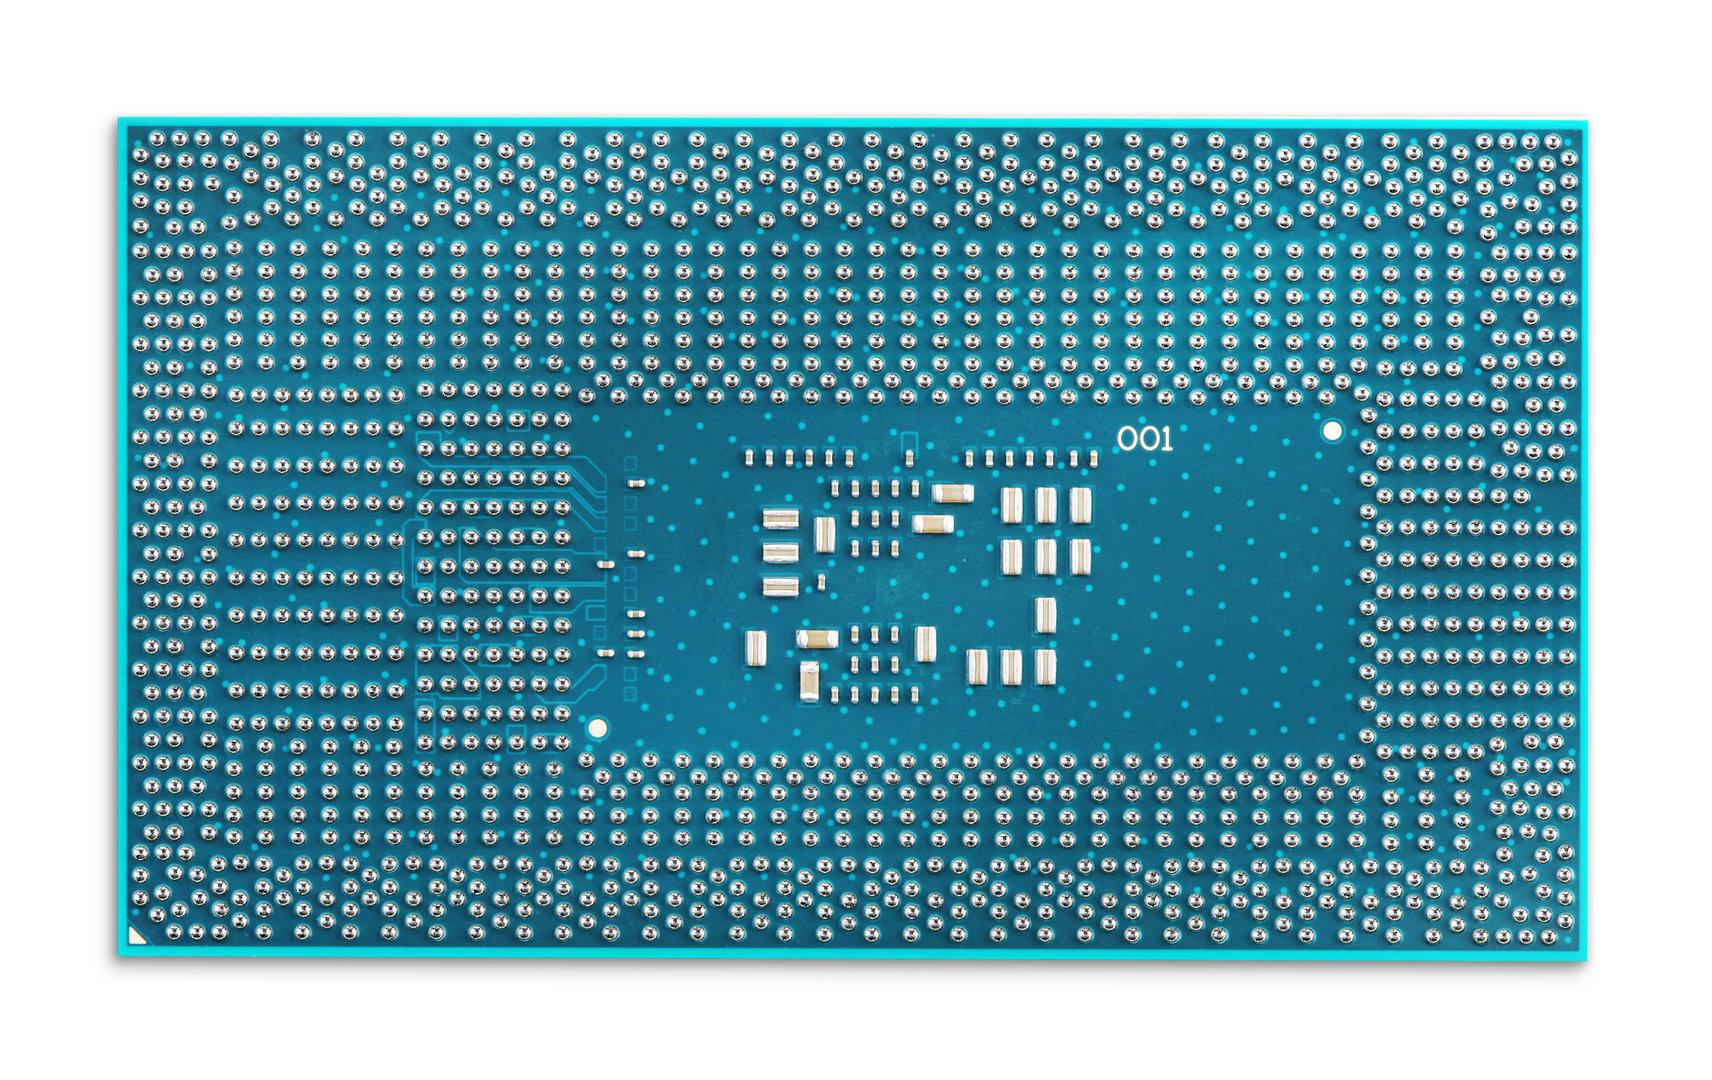 7th Gen Intel Core U-series